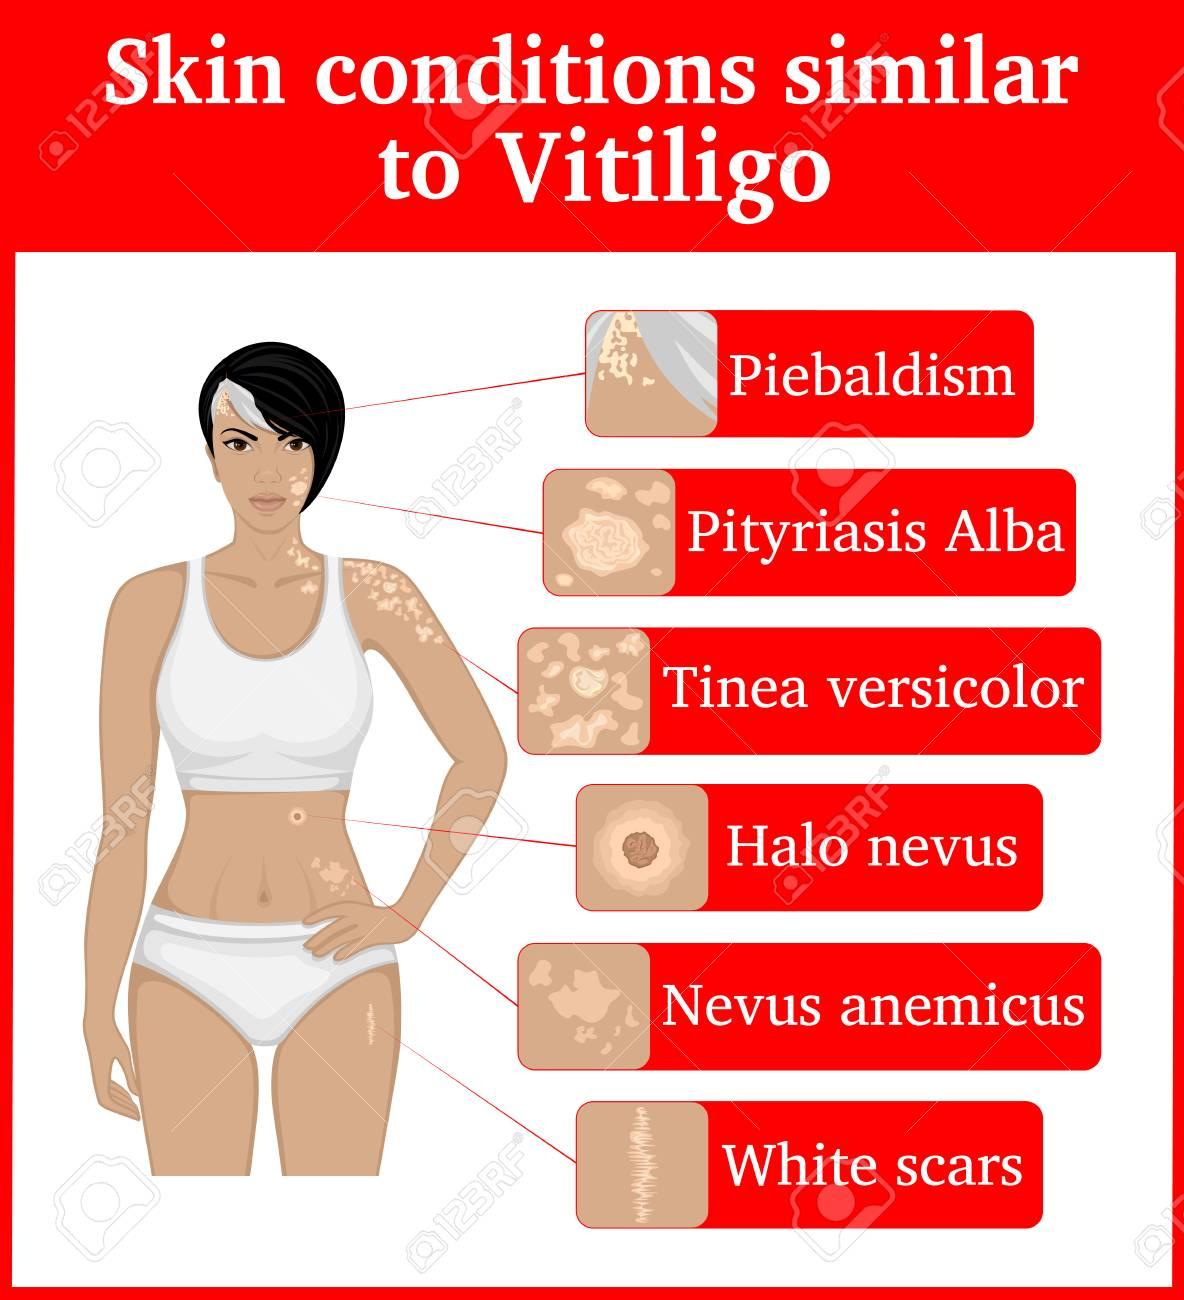 Six skin conditions having an external similarity with Vitiligo, such as Vitiligo. - 97470548